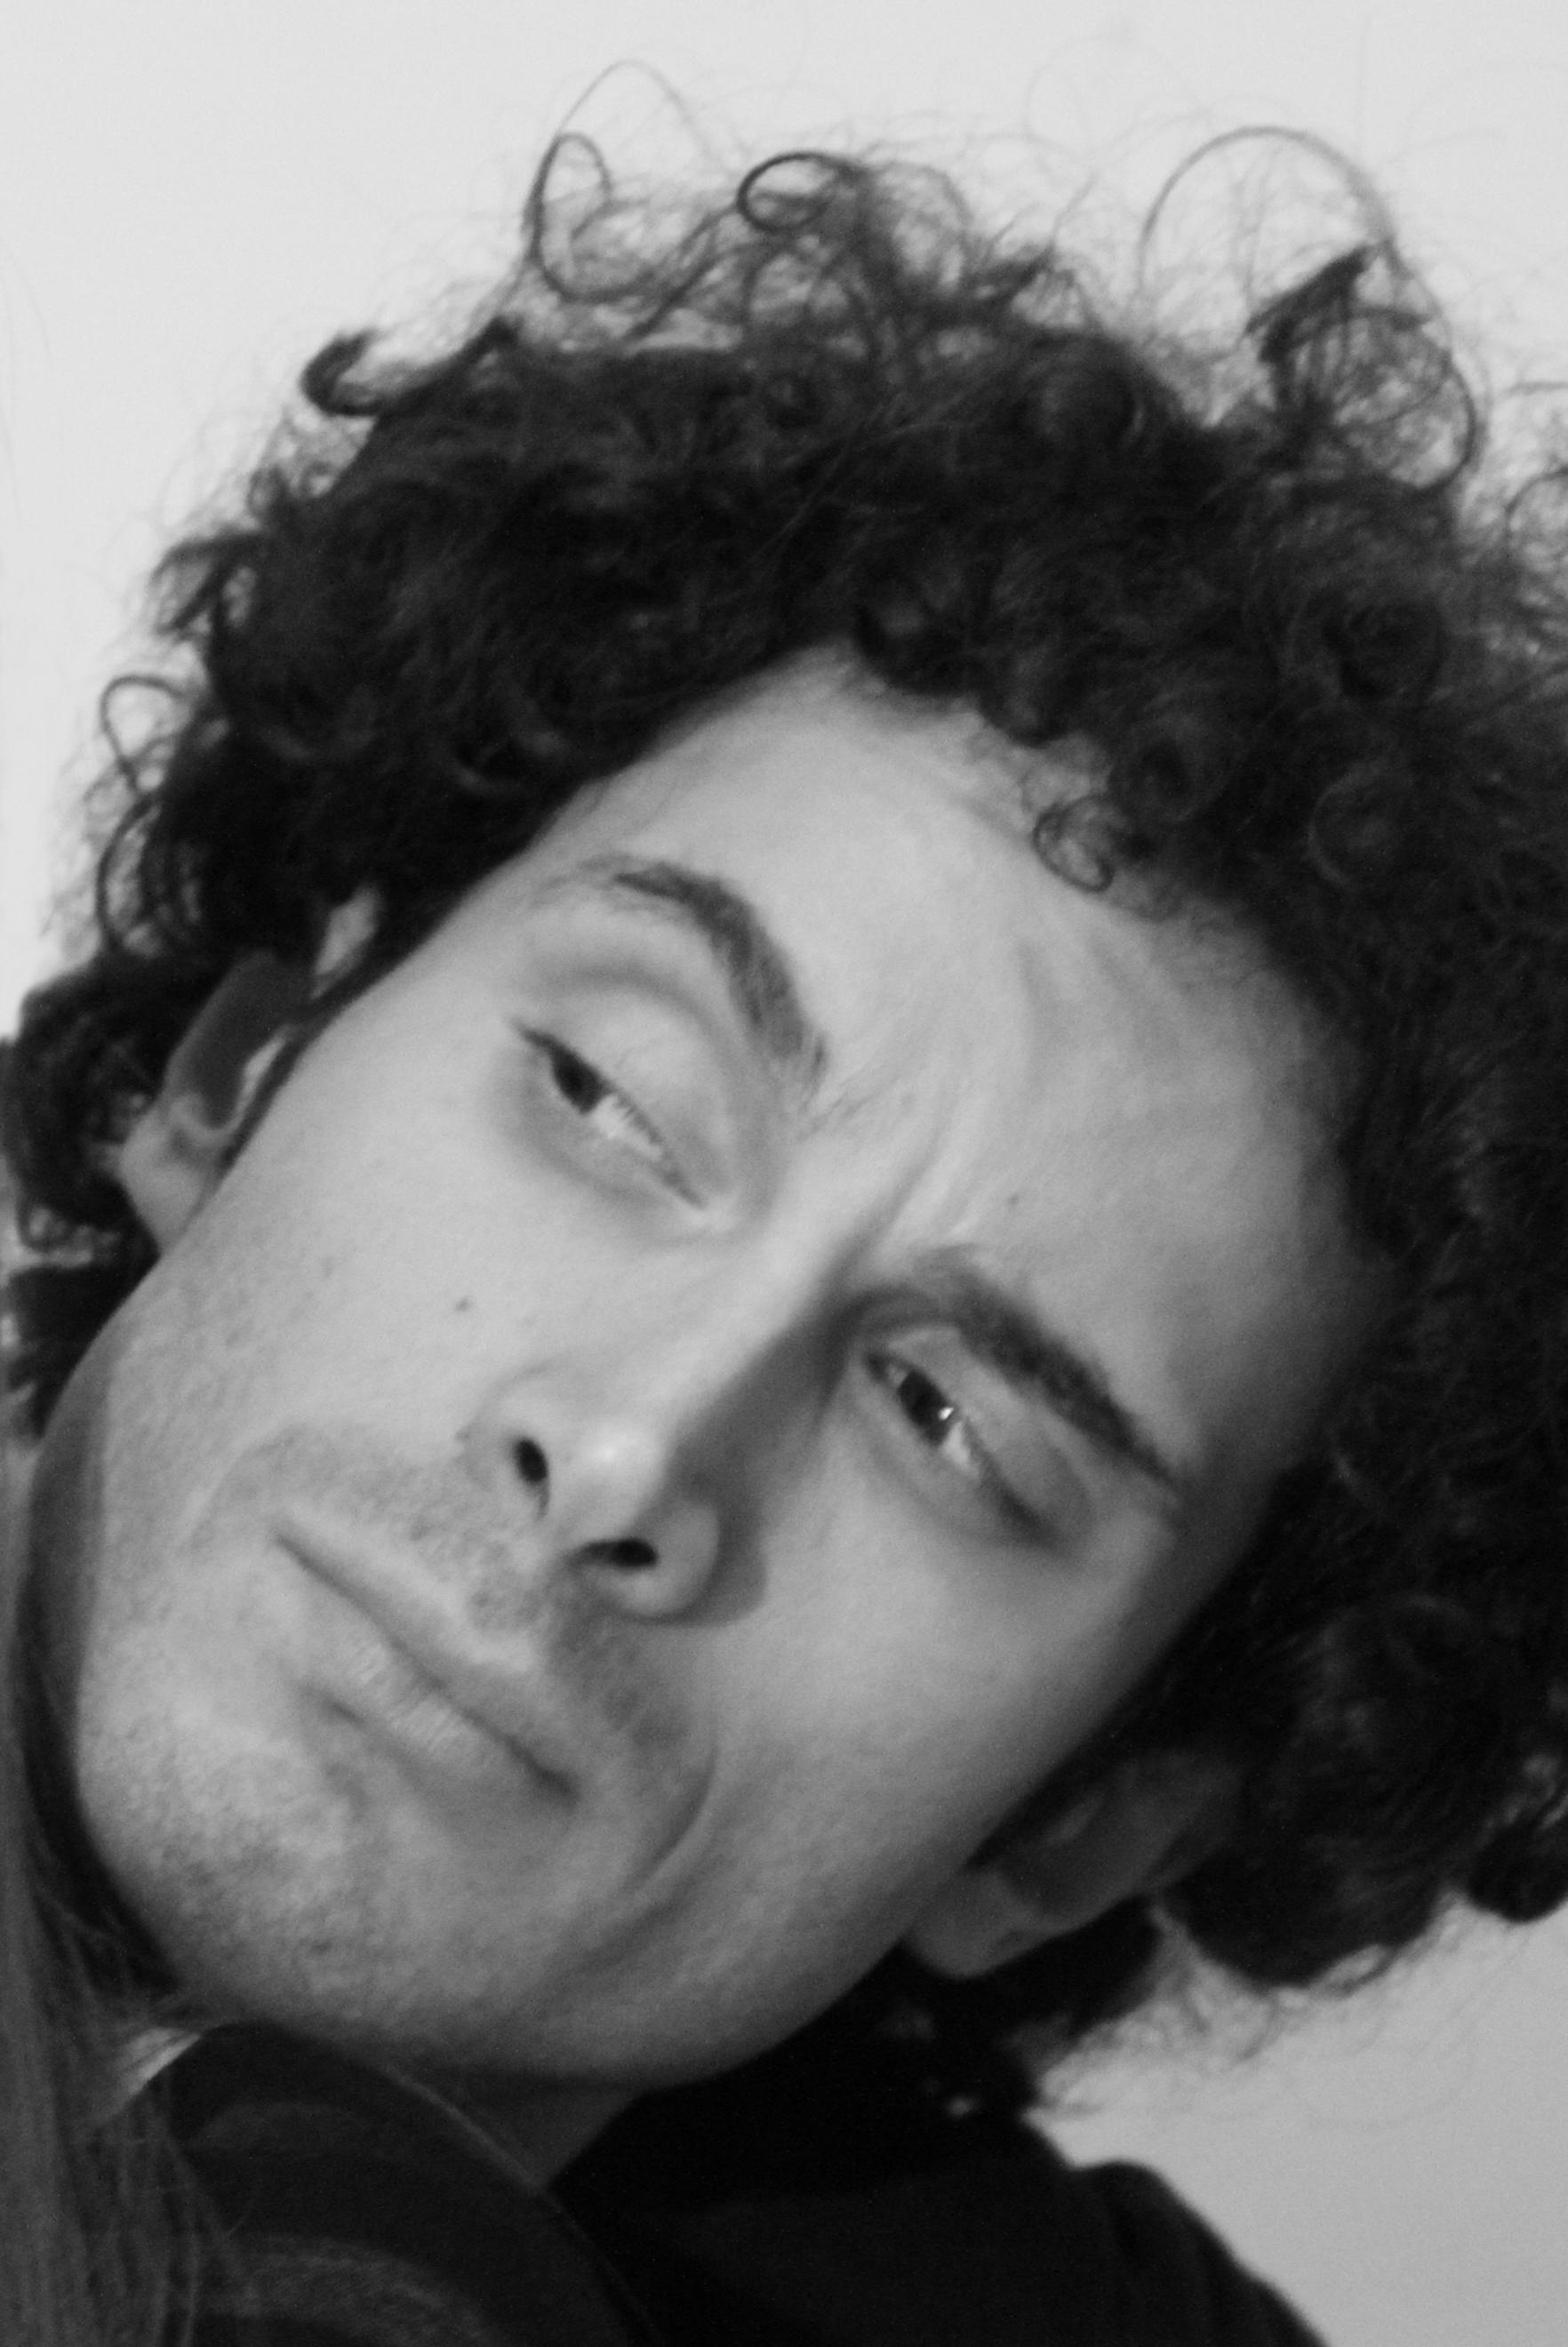 Intervista per Francesco Chiatante, regista di Animeland – Racconti tra manga, anime e cosplay